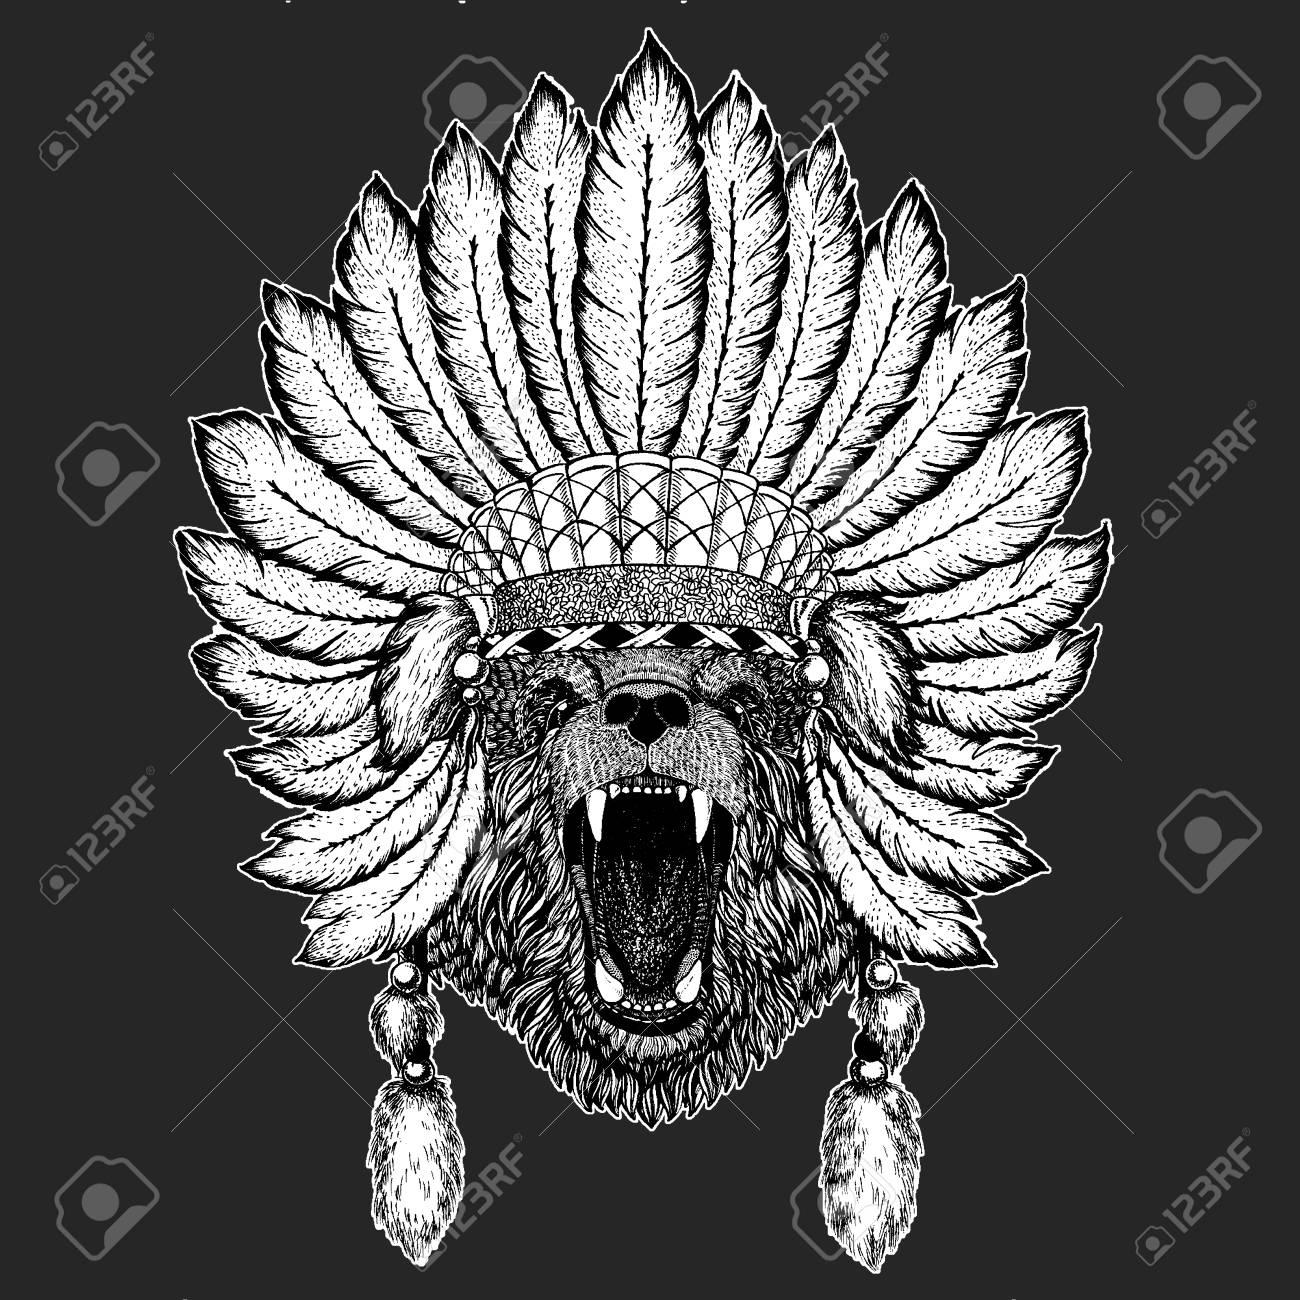 c8bcdbb7662cc Bear Traditional ethnic indian boho headdress Tribal shaman hat Ceremonial  element Stock Vector - 103667002